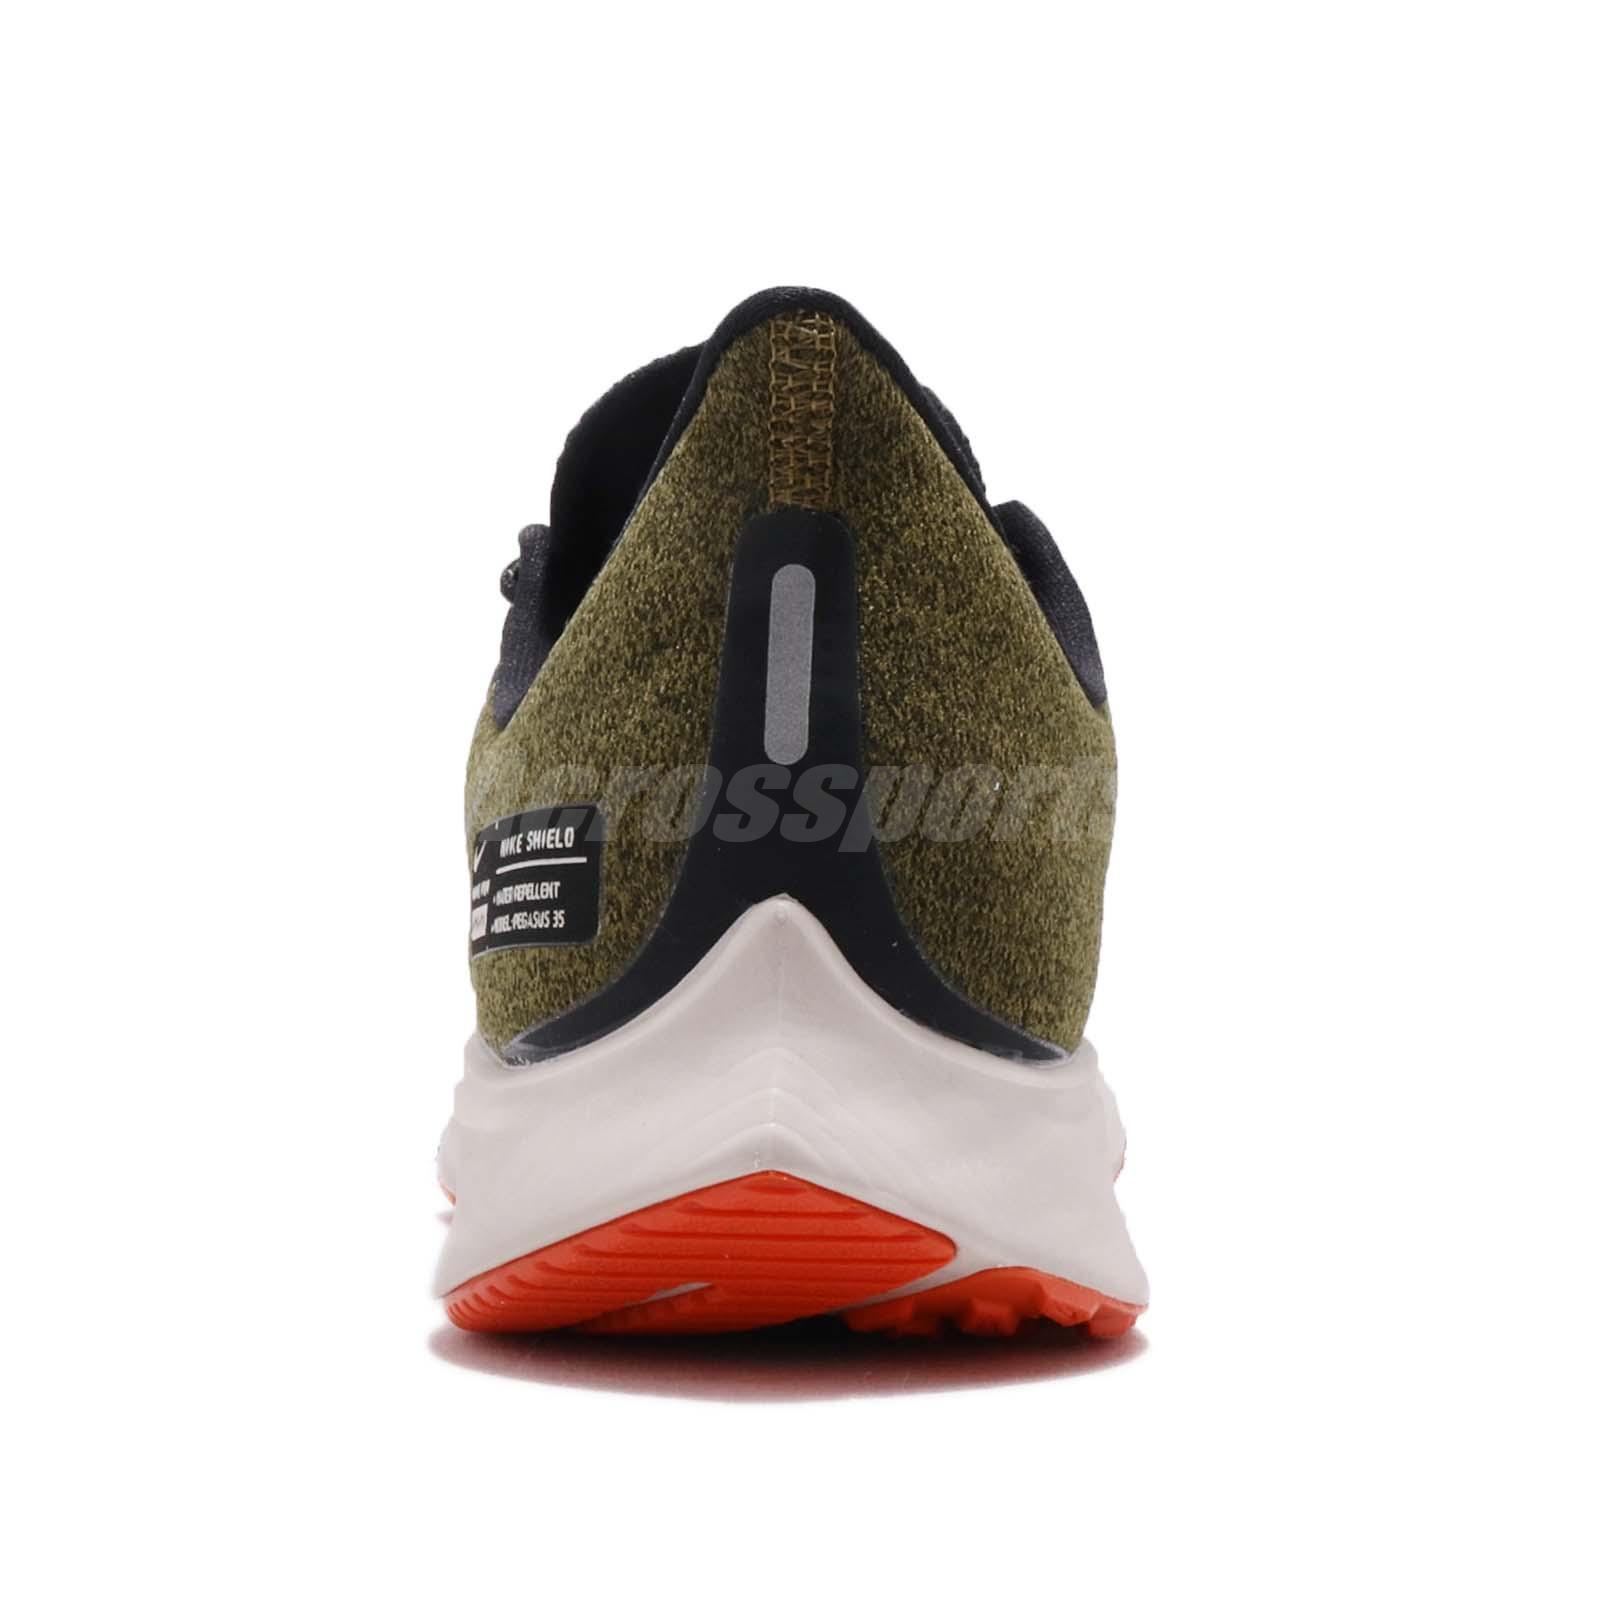 8668be0ebfa5 Nike Air Zoom Pegasus 35 Shield GS Olive Flak Black Kid Women ...